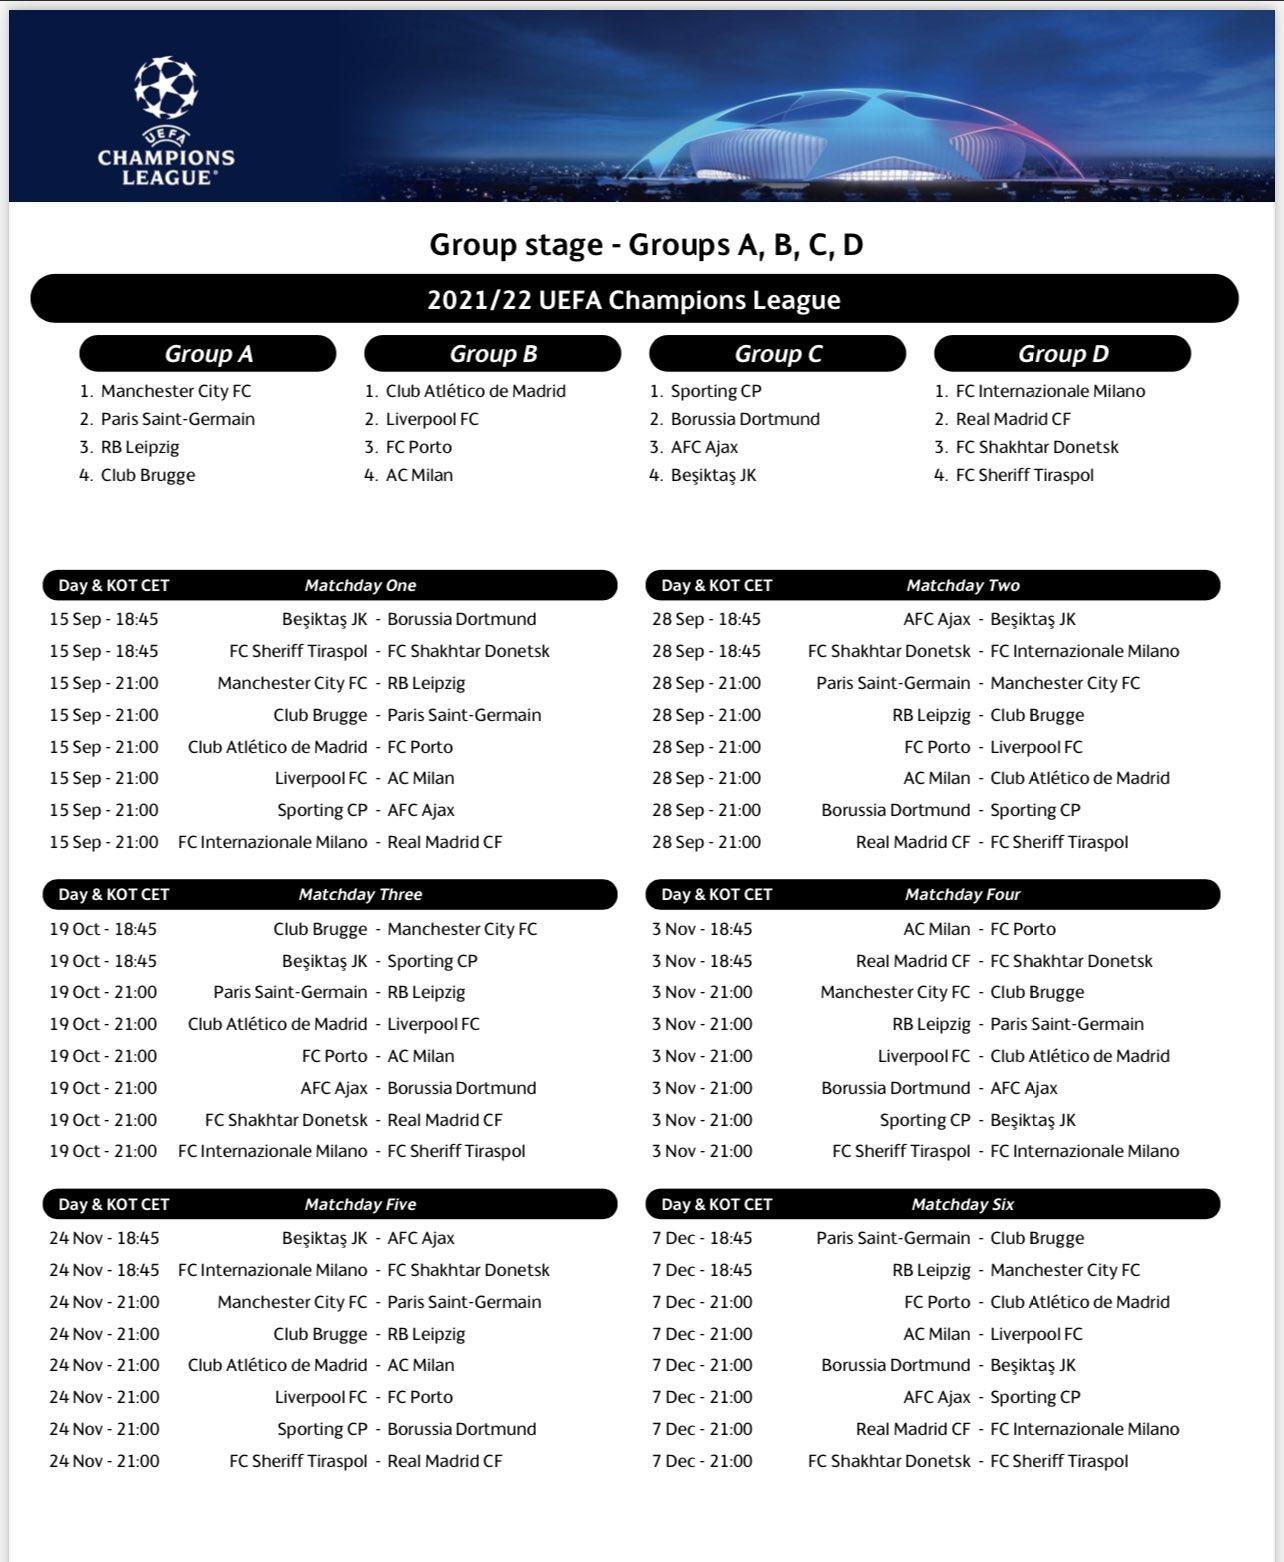 2708-horarios-champions-fasegrupos.jpg